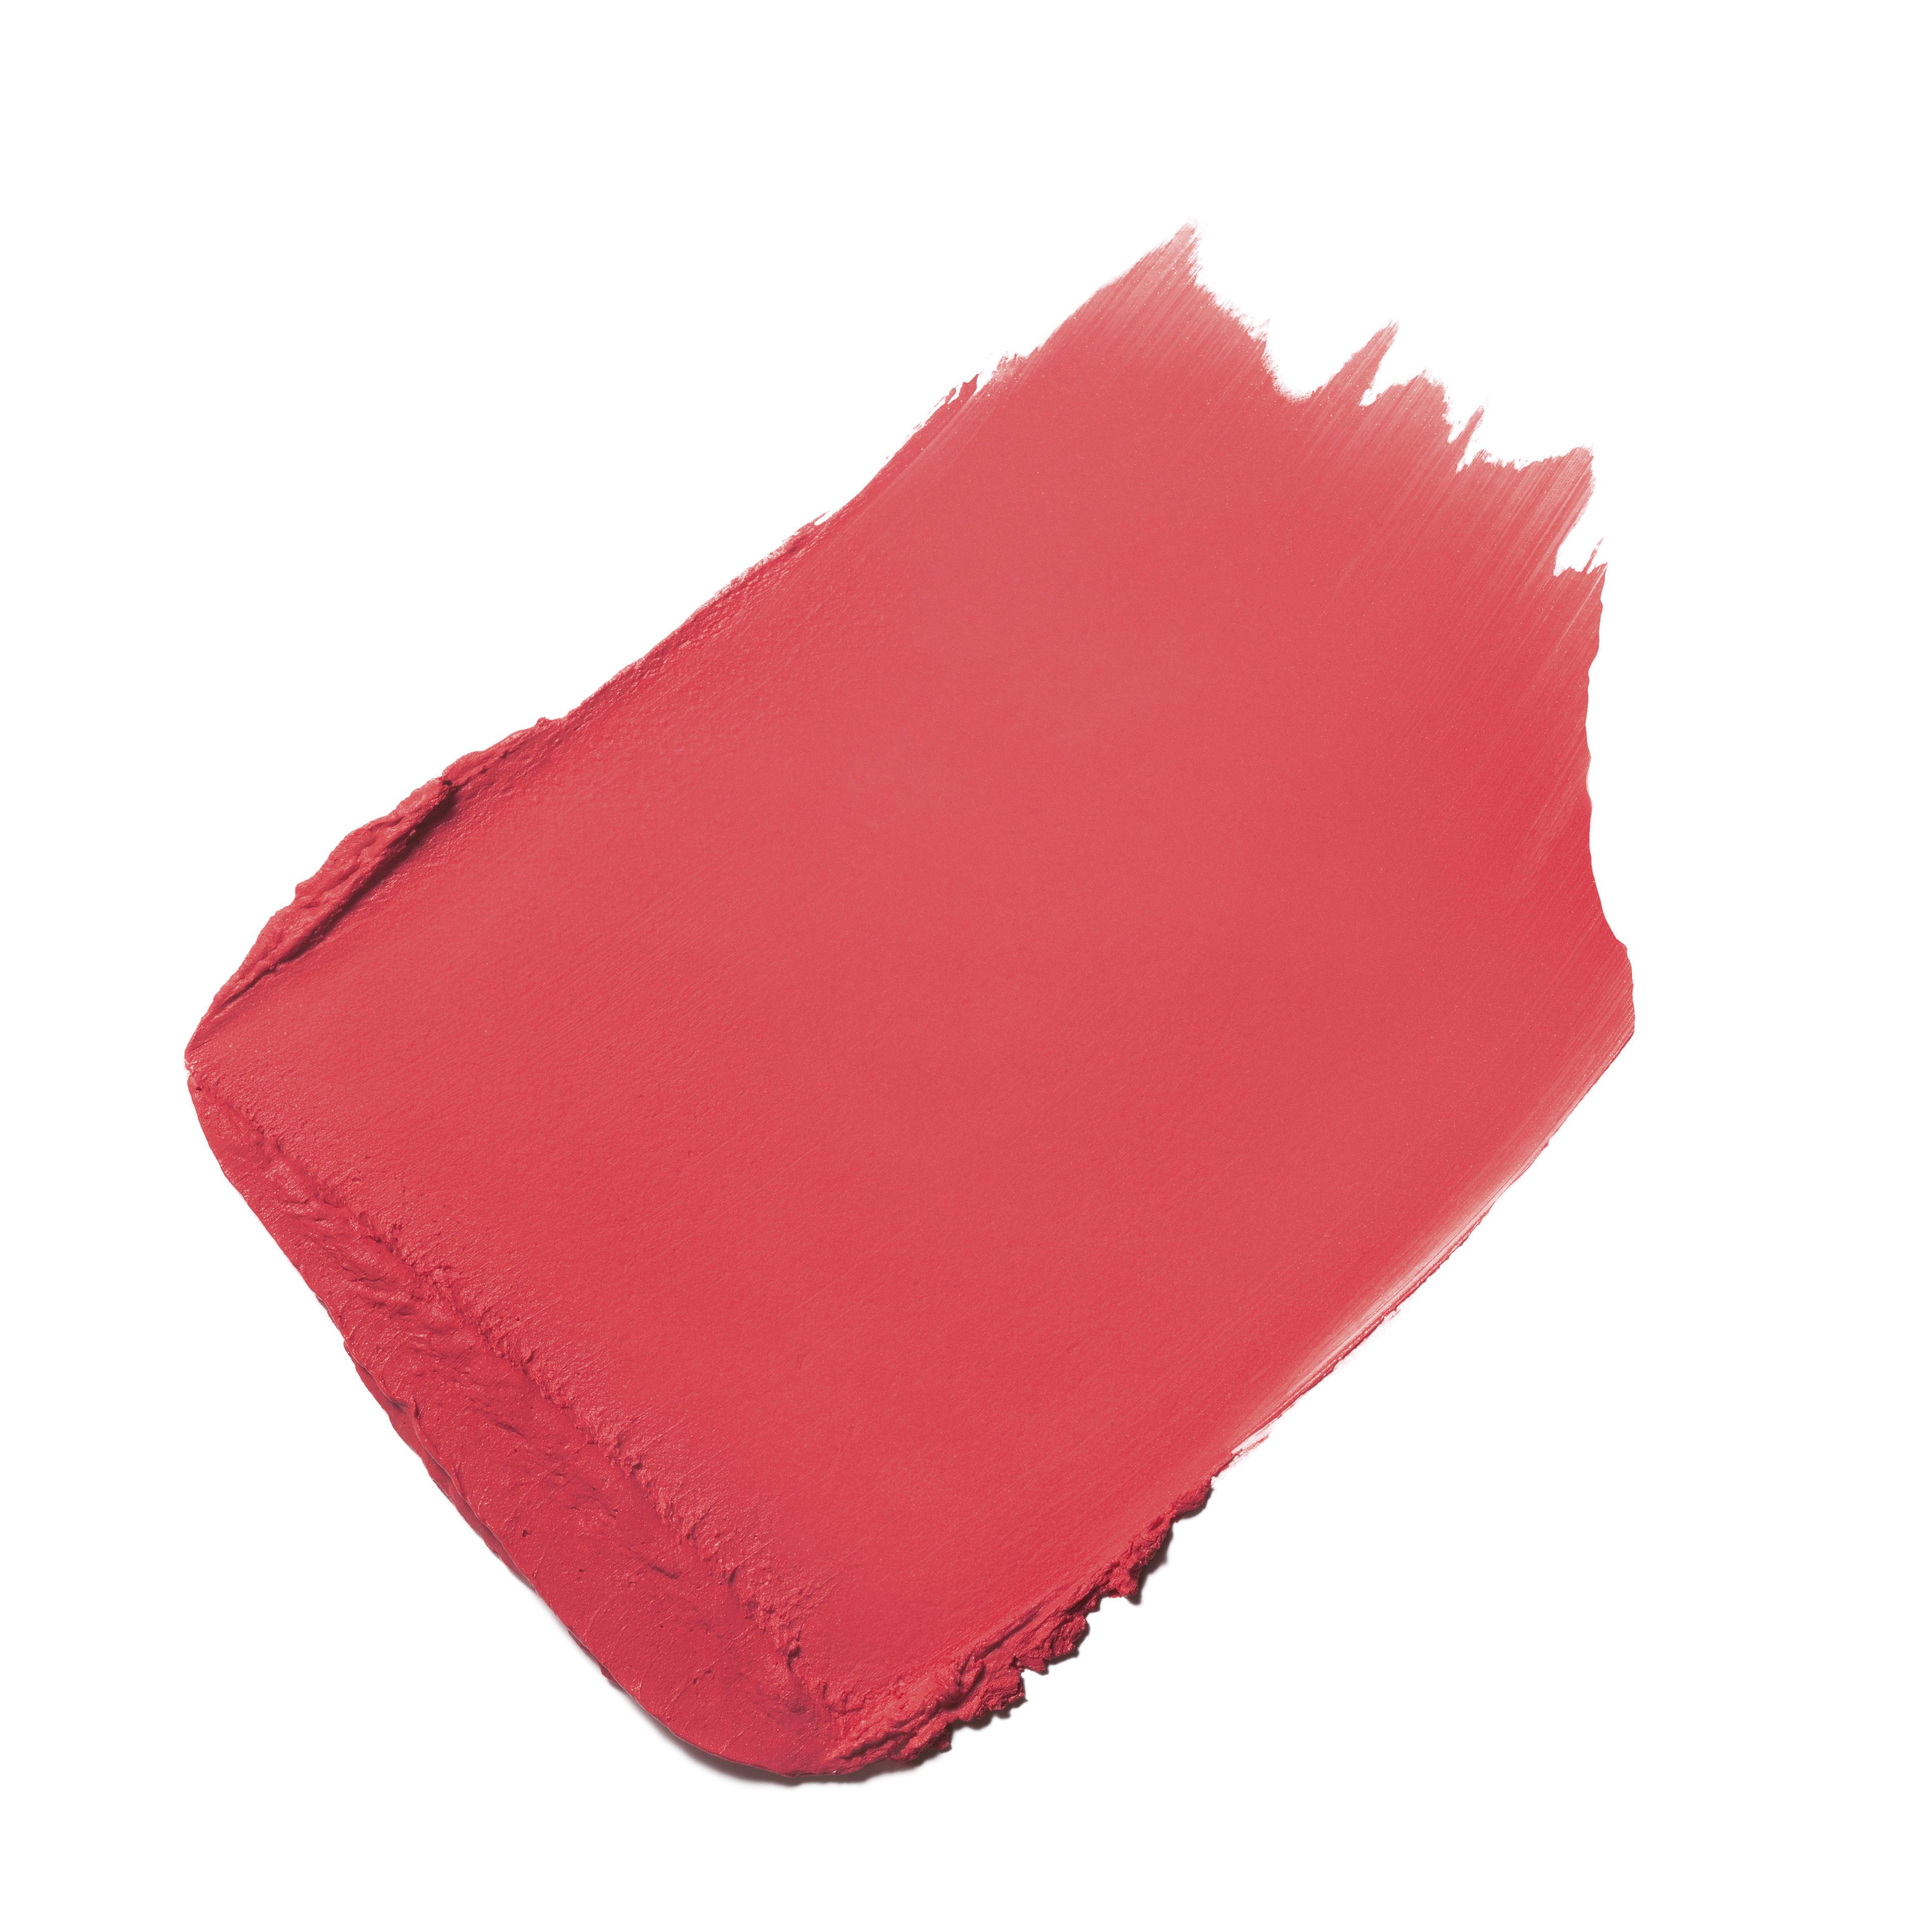 ROUGE ALLURE VELVET - makeup - 3.5g - Podstawowy widok faktury